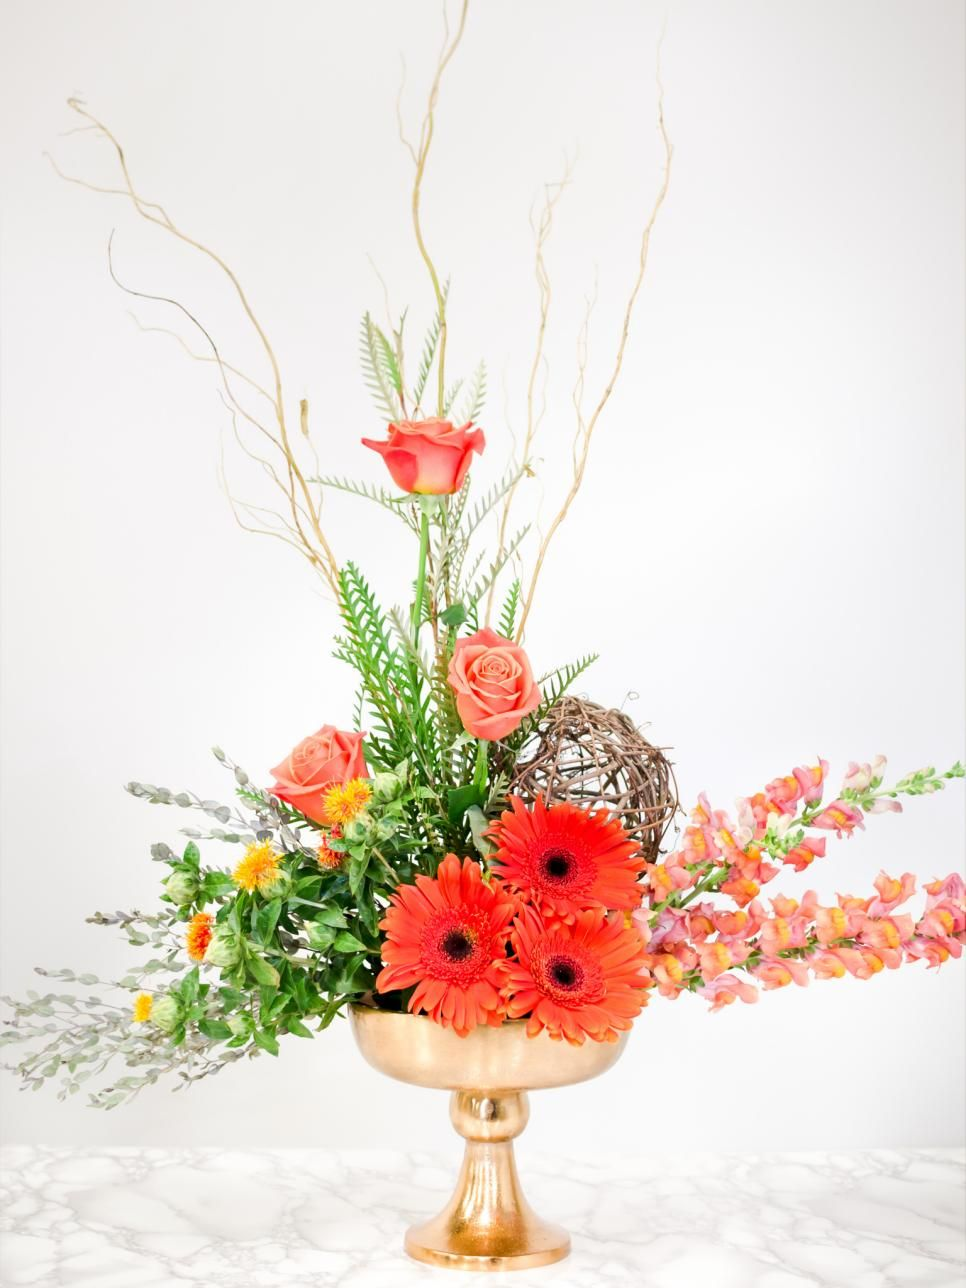 Easy Flower Arrangements 37 easy fall flower arrangement ideas | 32, design styles and fall